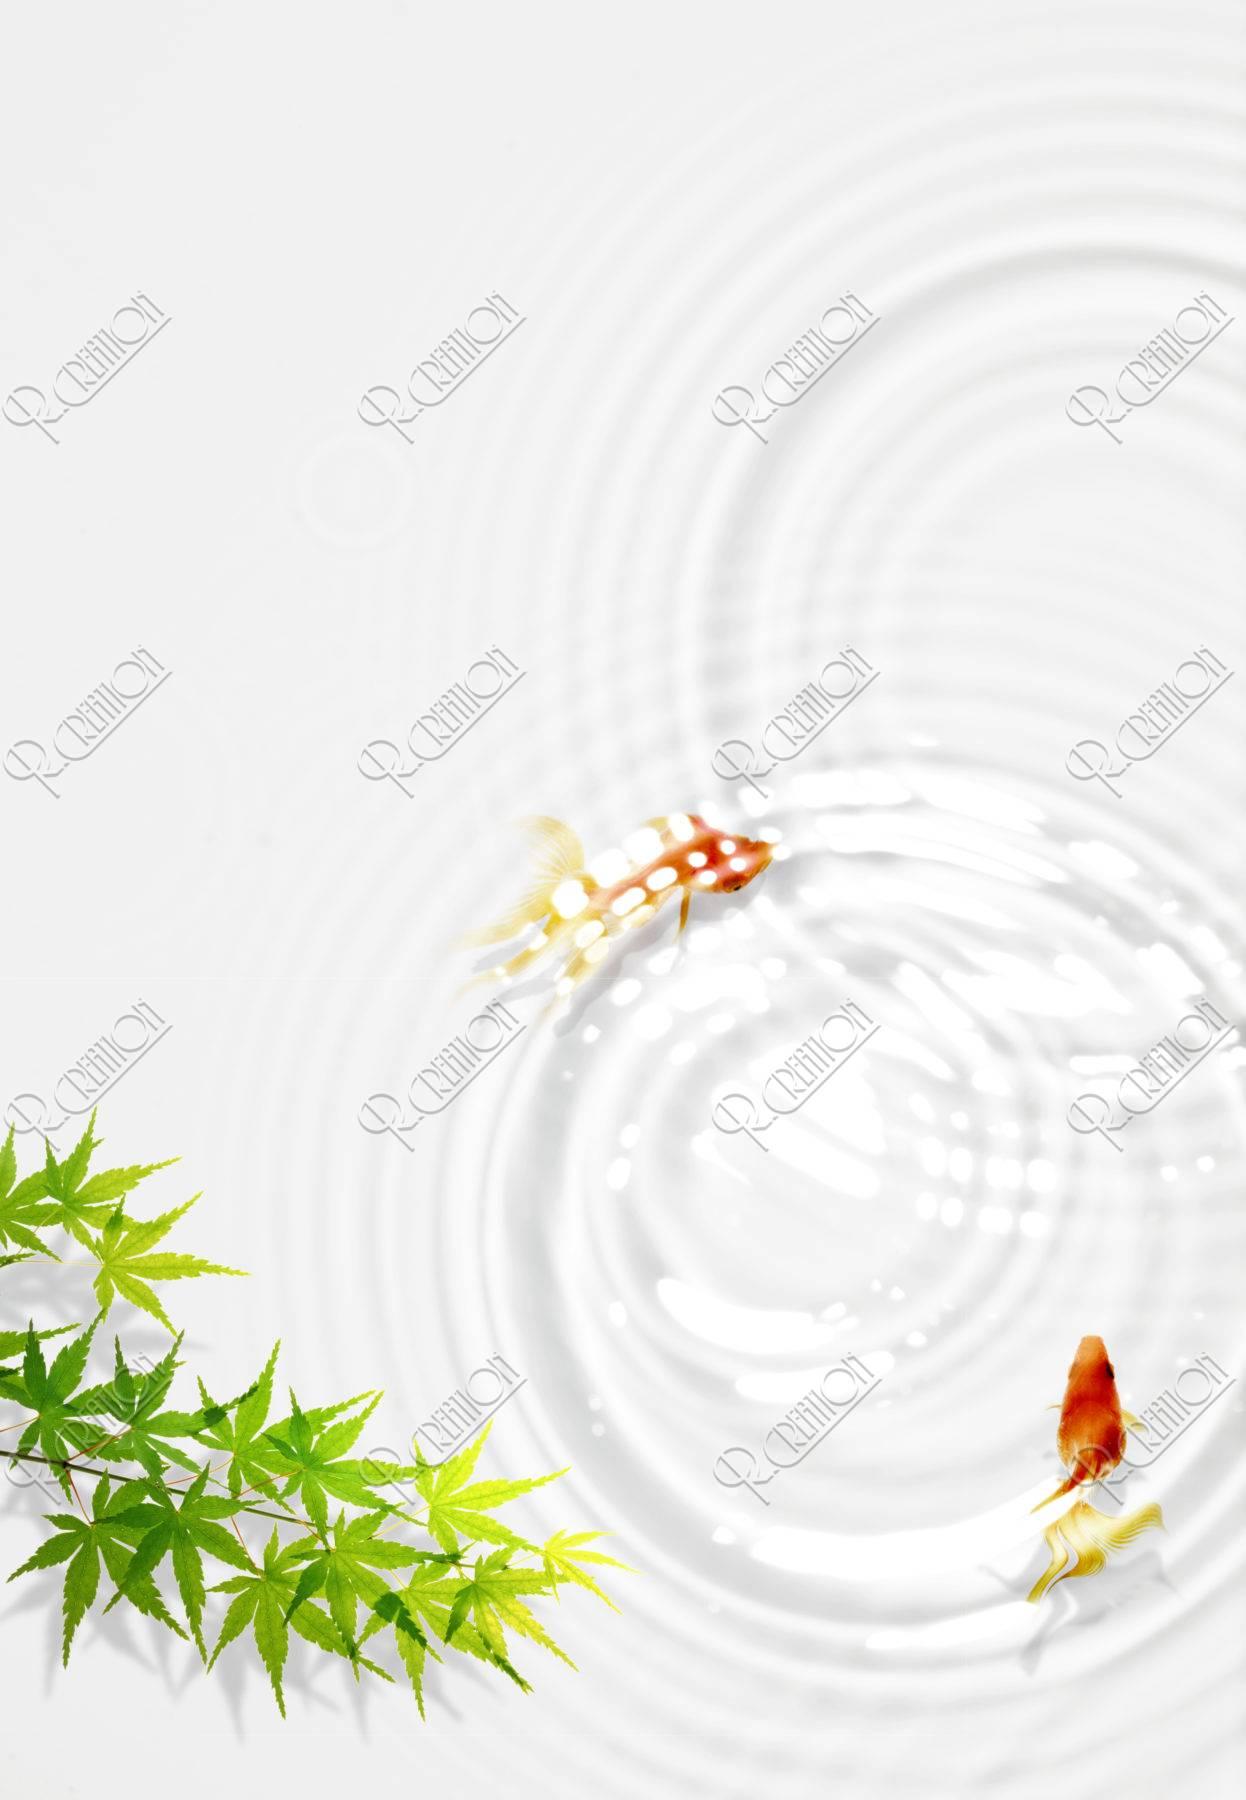 金魚と波紋